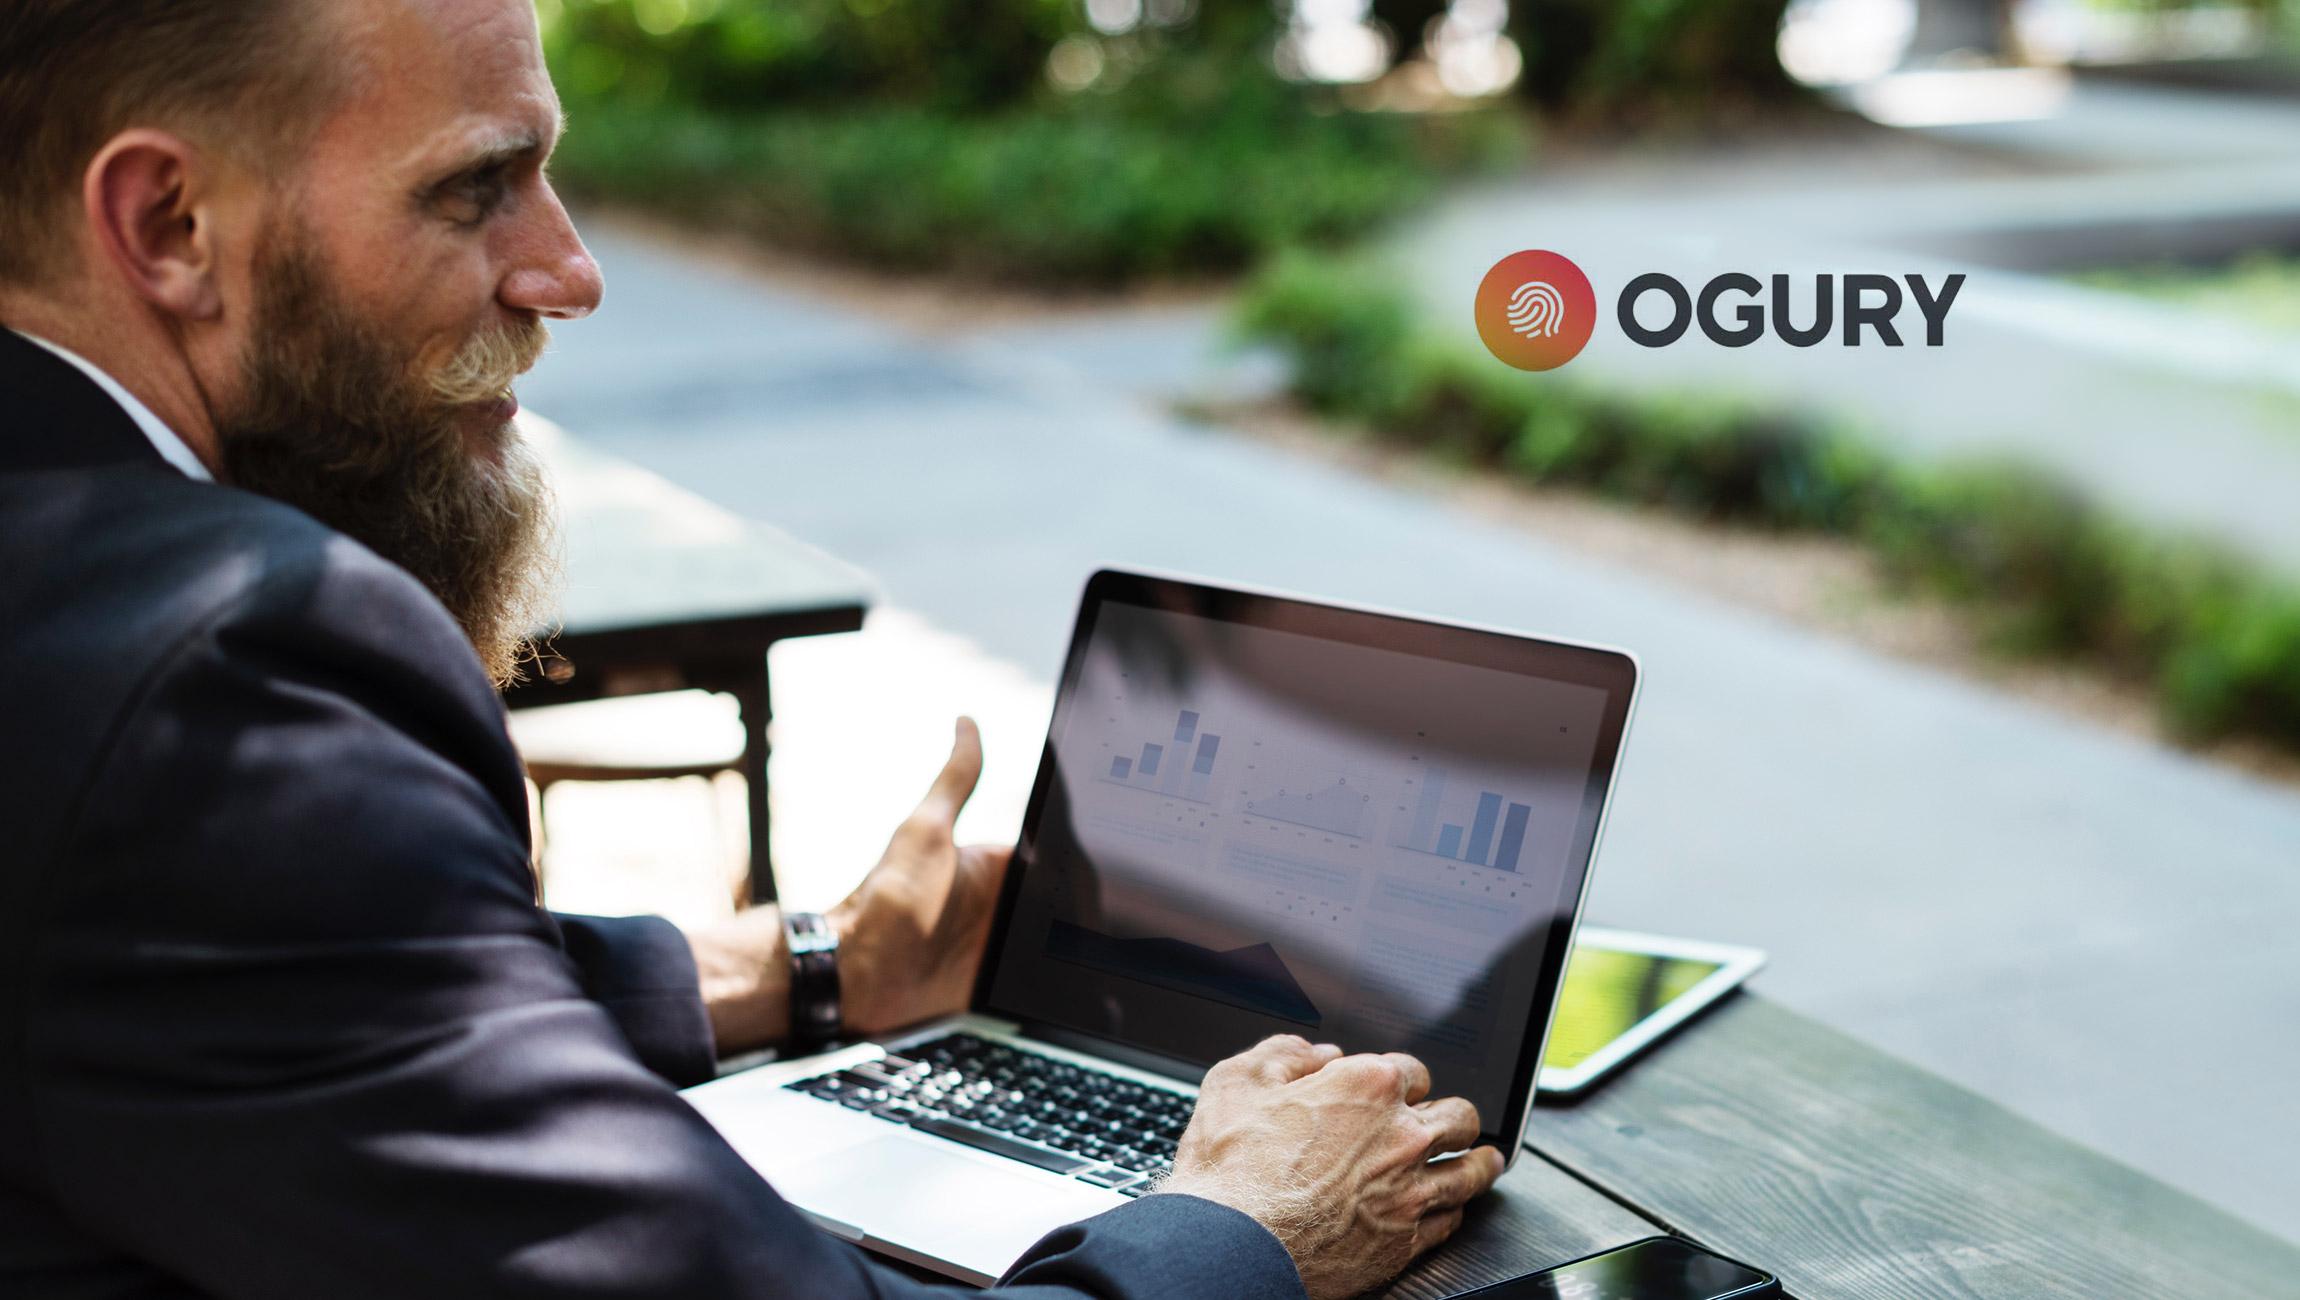 London-Headquartered Ogury Reaches the $100 Million Revenue Milestone